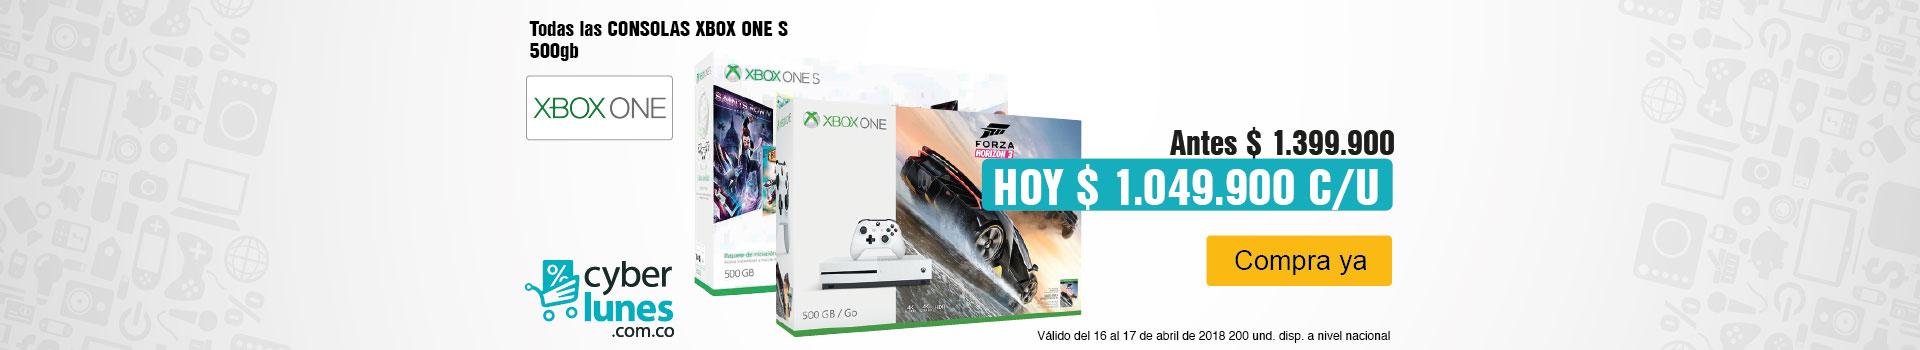 AK-KT-BCAT-12-videojuegos-PP---Xbox-One-S-ref-s-Abr16